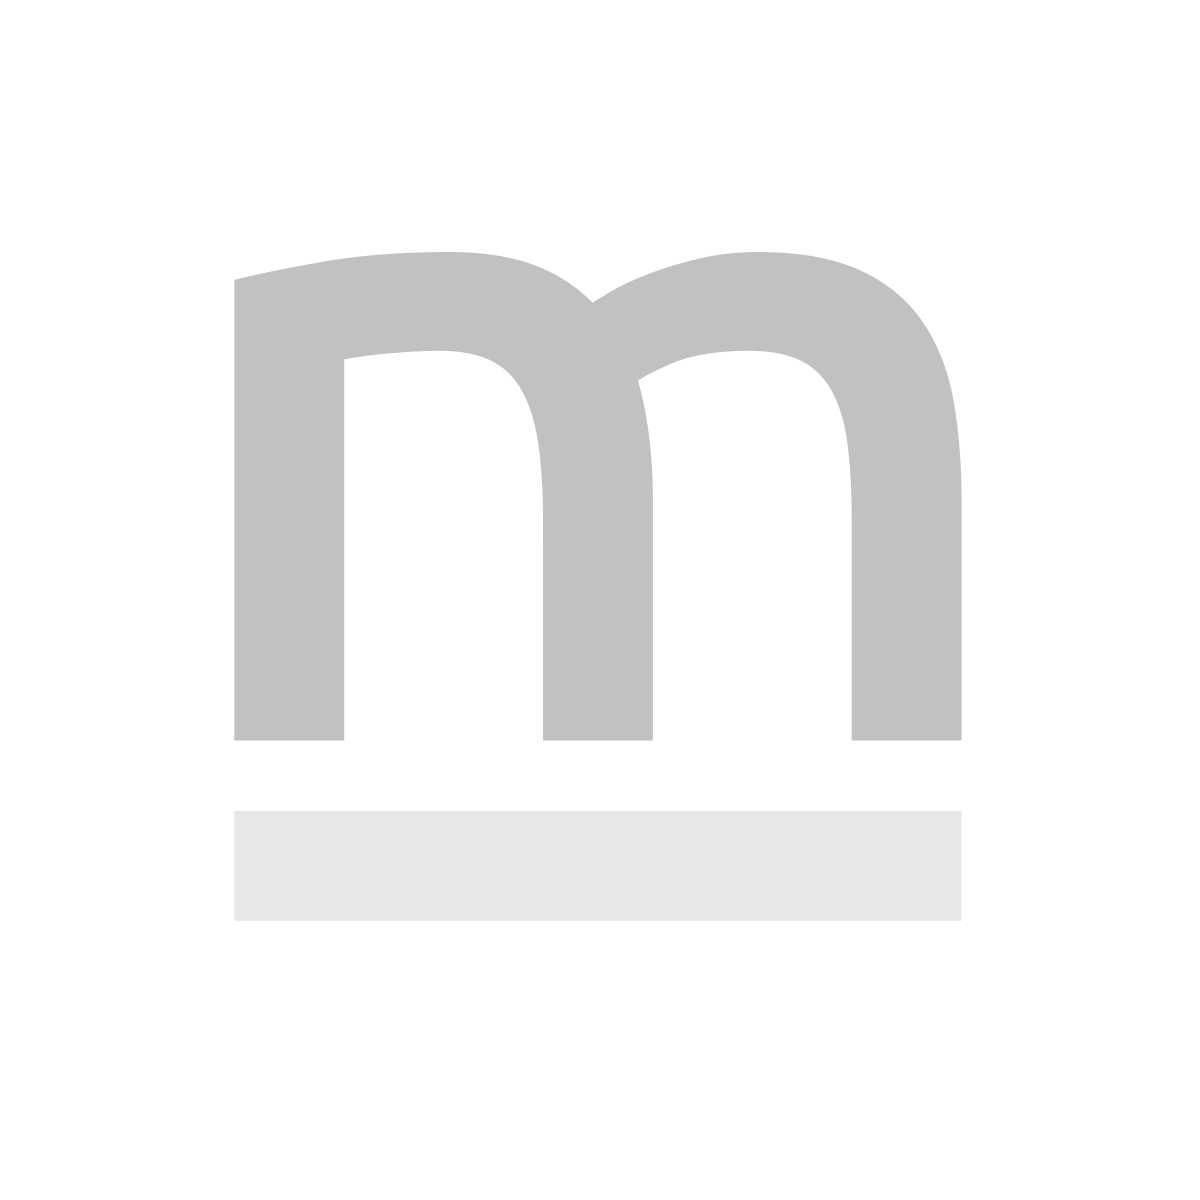 Krzesło CLAUDINE 1 VELVET beżowe